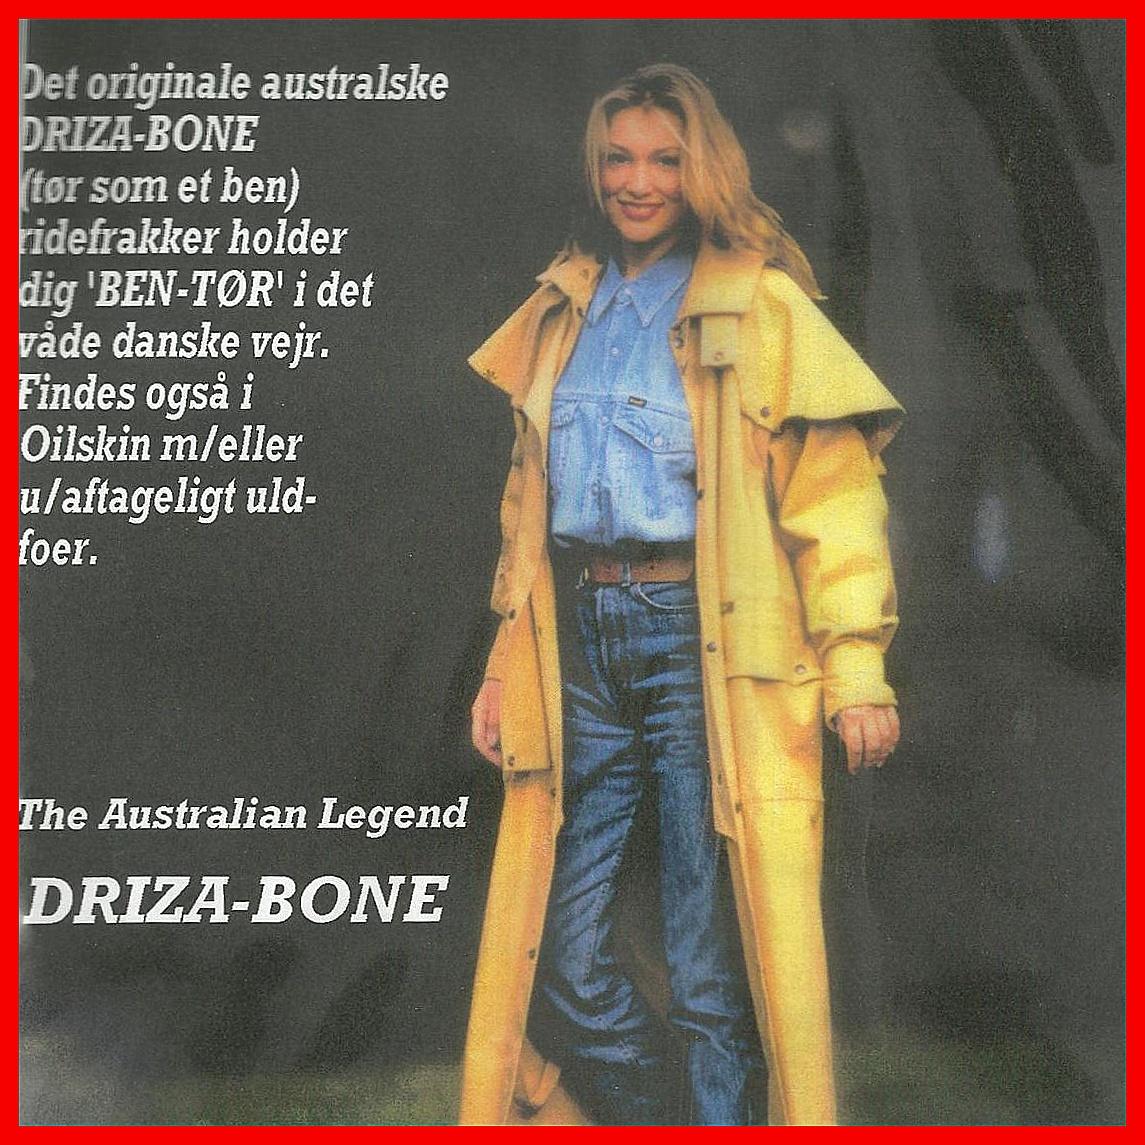 DURAPEL fra Australske DRIZA BONE køb online her hos Fit For Core